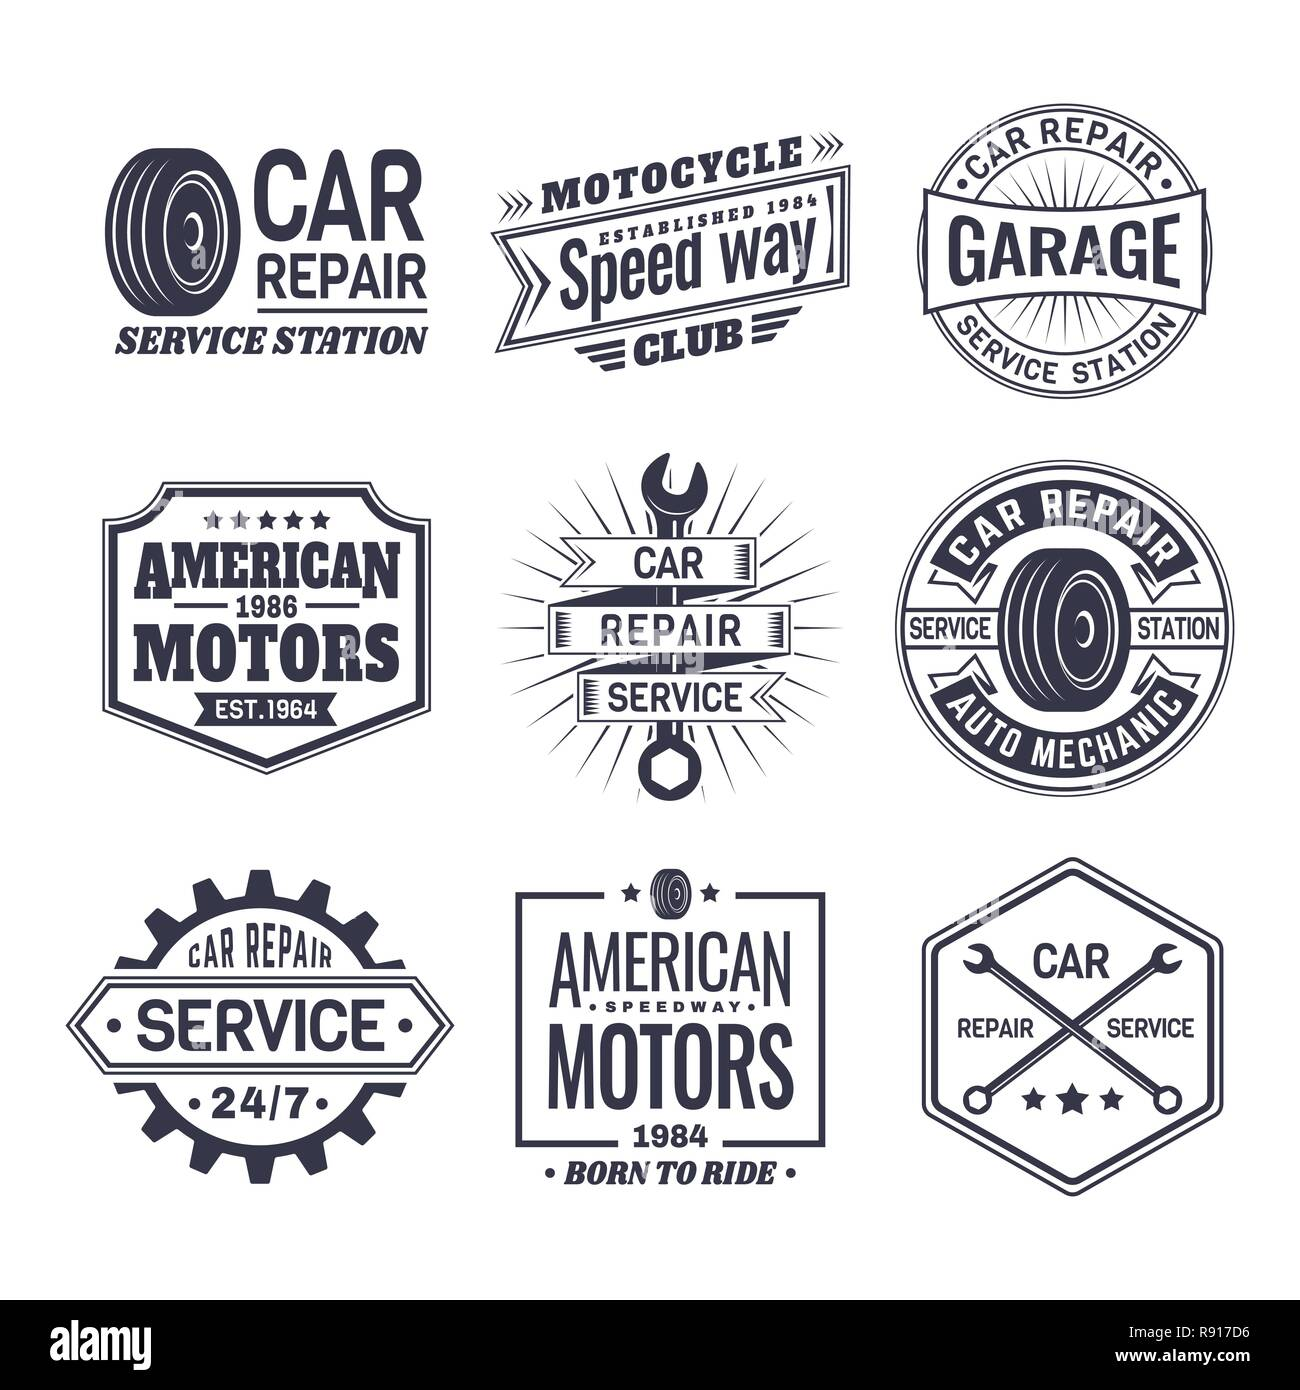 Logo for car repair service station - Stock Vector